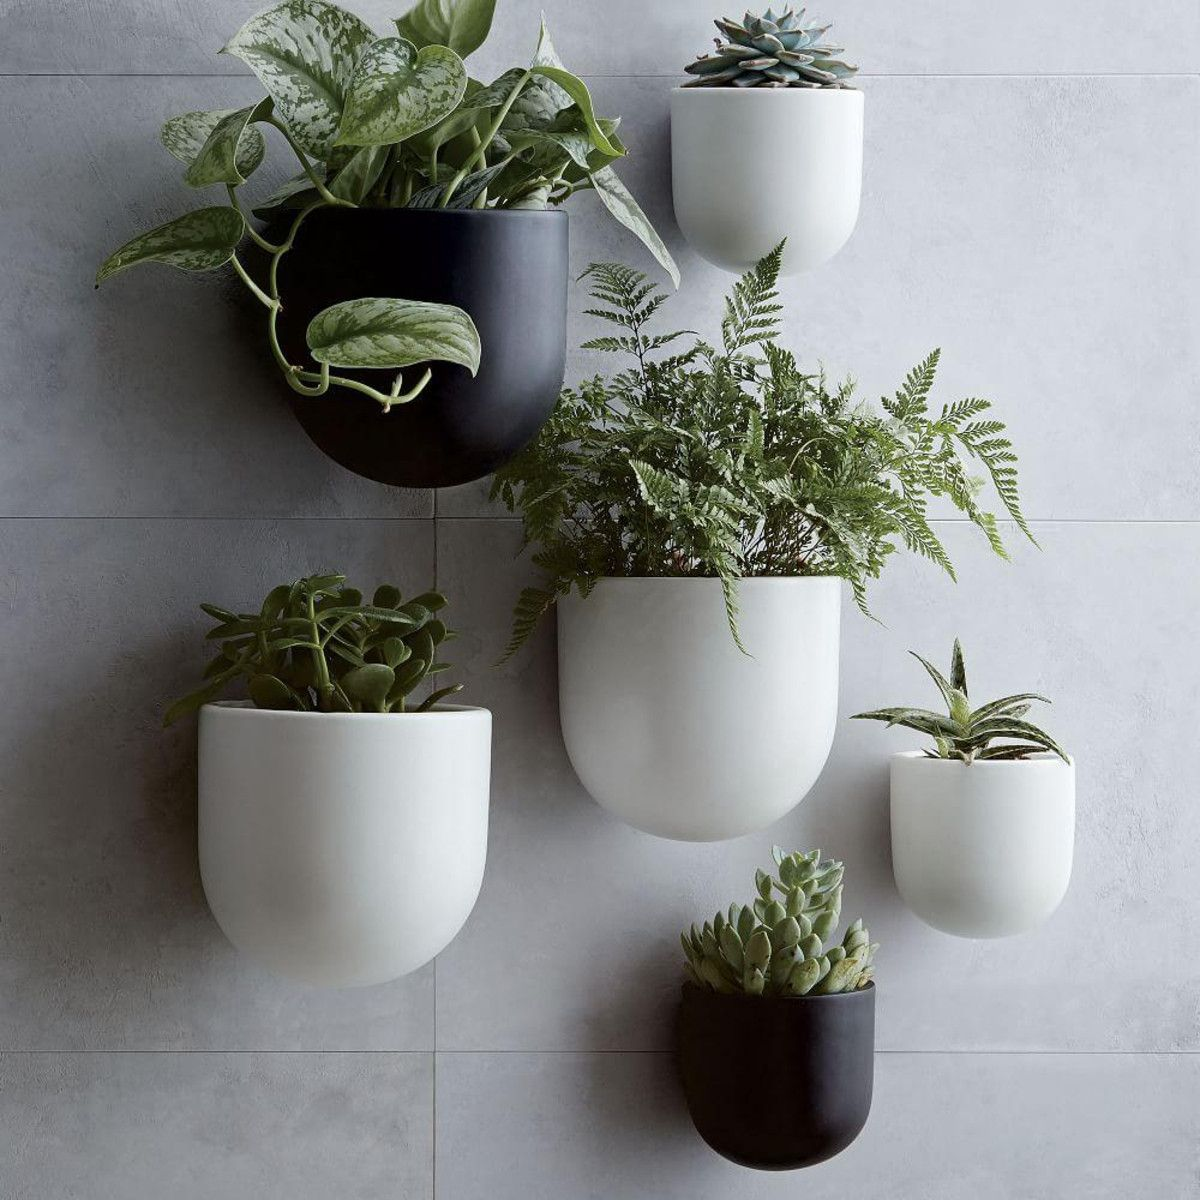 Ceramic Wallscape Planters Ceramic Wall Planters Indoor